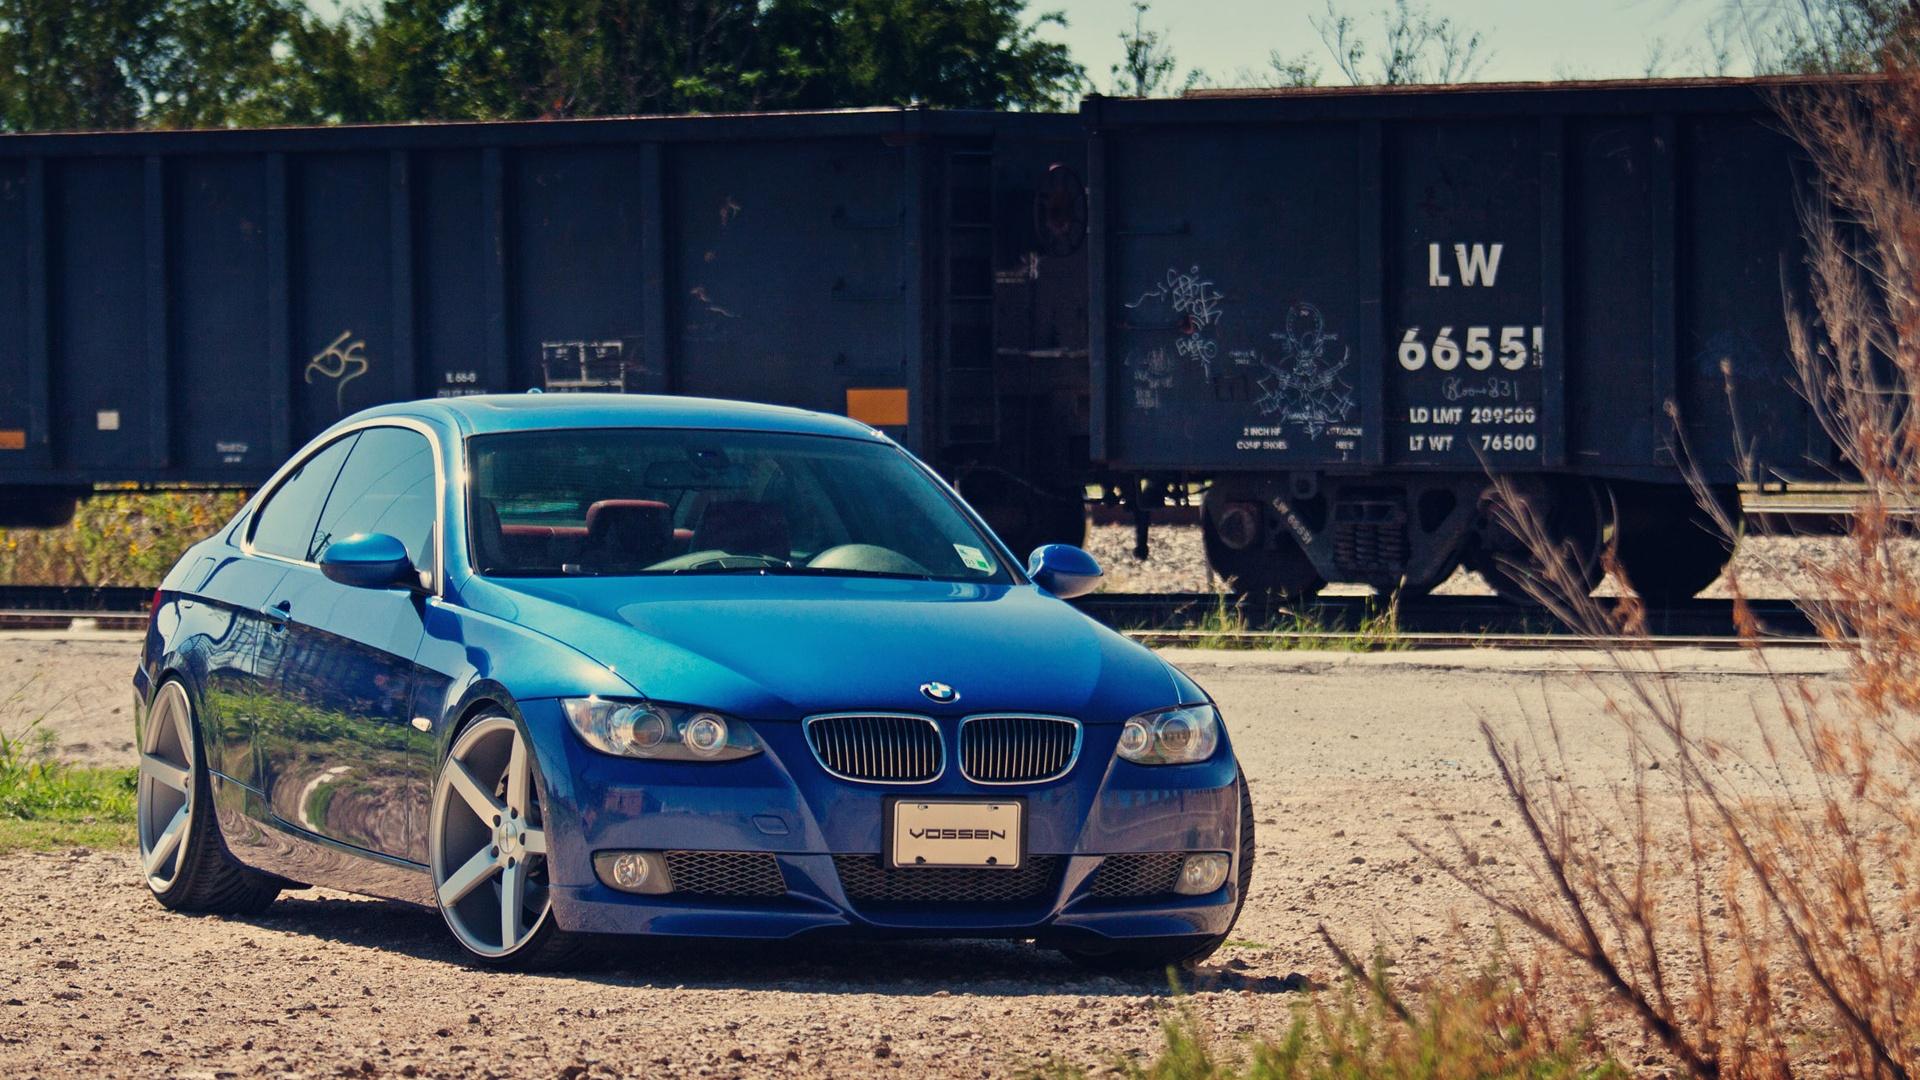 Wallpaper Bmw Blue Car 1920x1200 Hd Picture Image